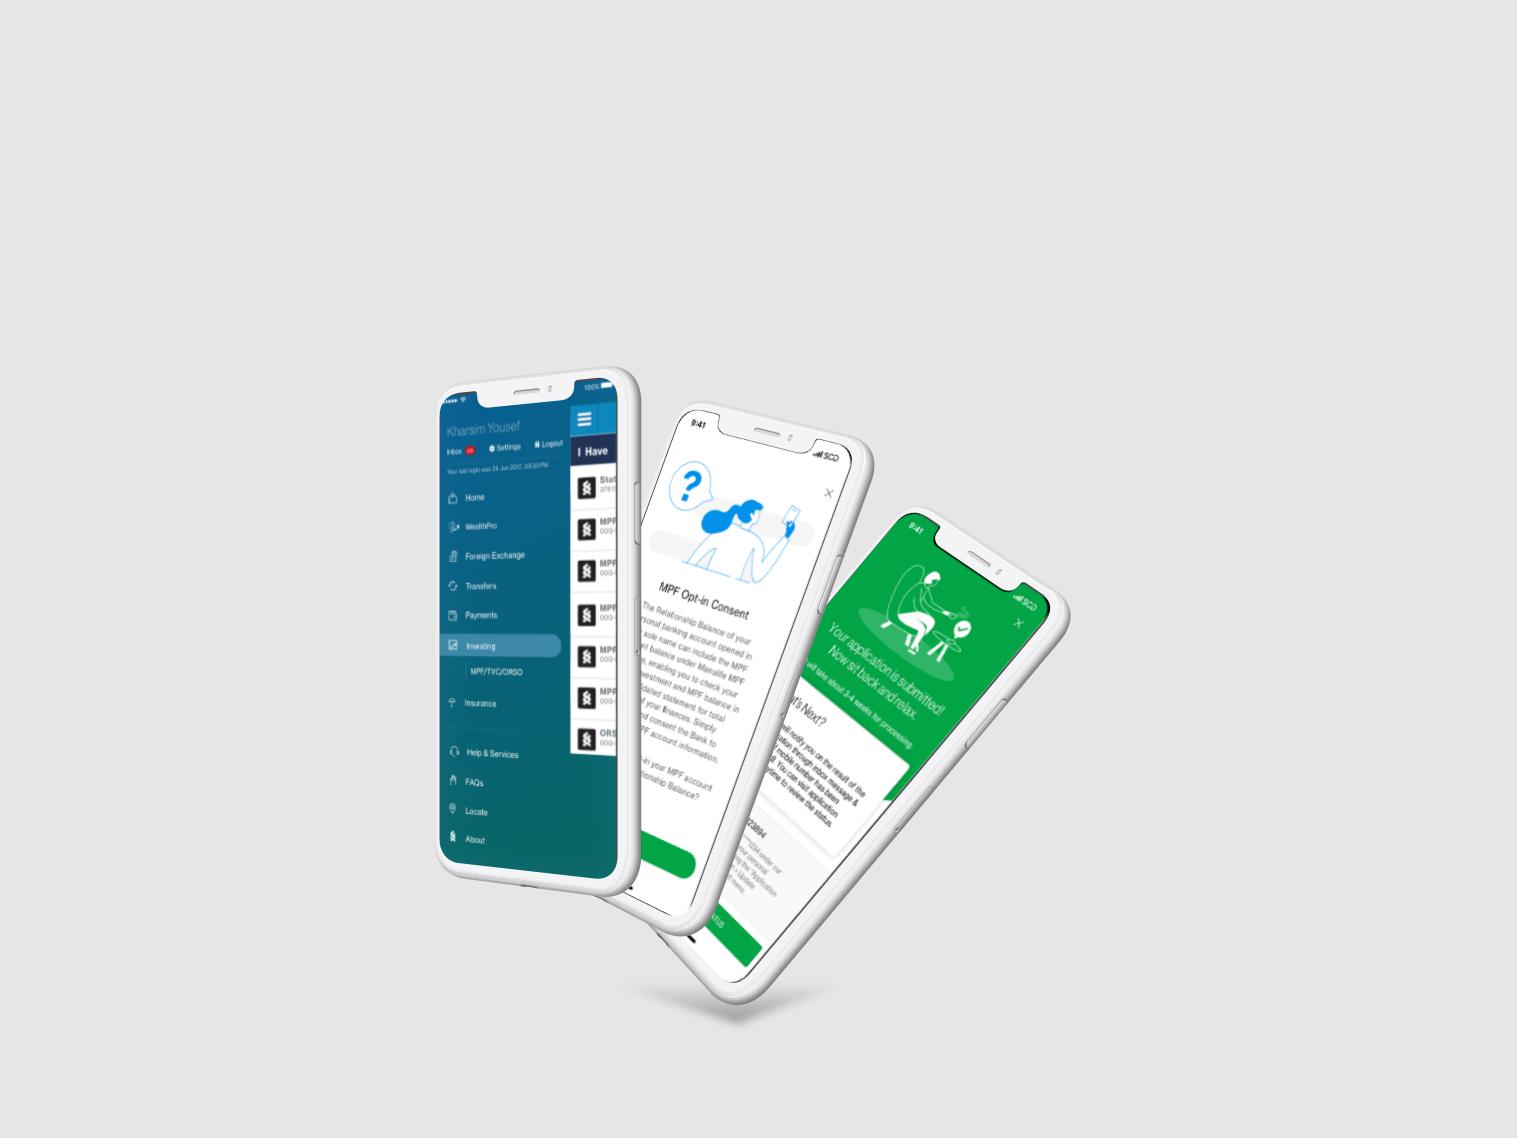 SC MPF HK Mobile Banking Screens sketchapp design mobile sketch uiux